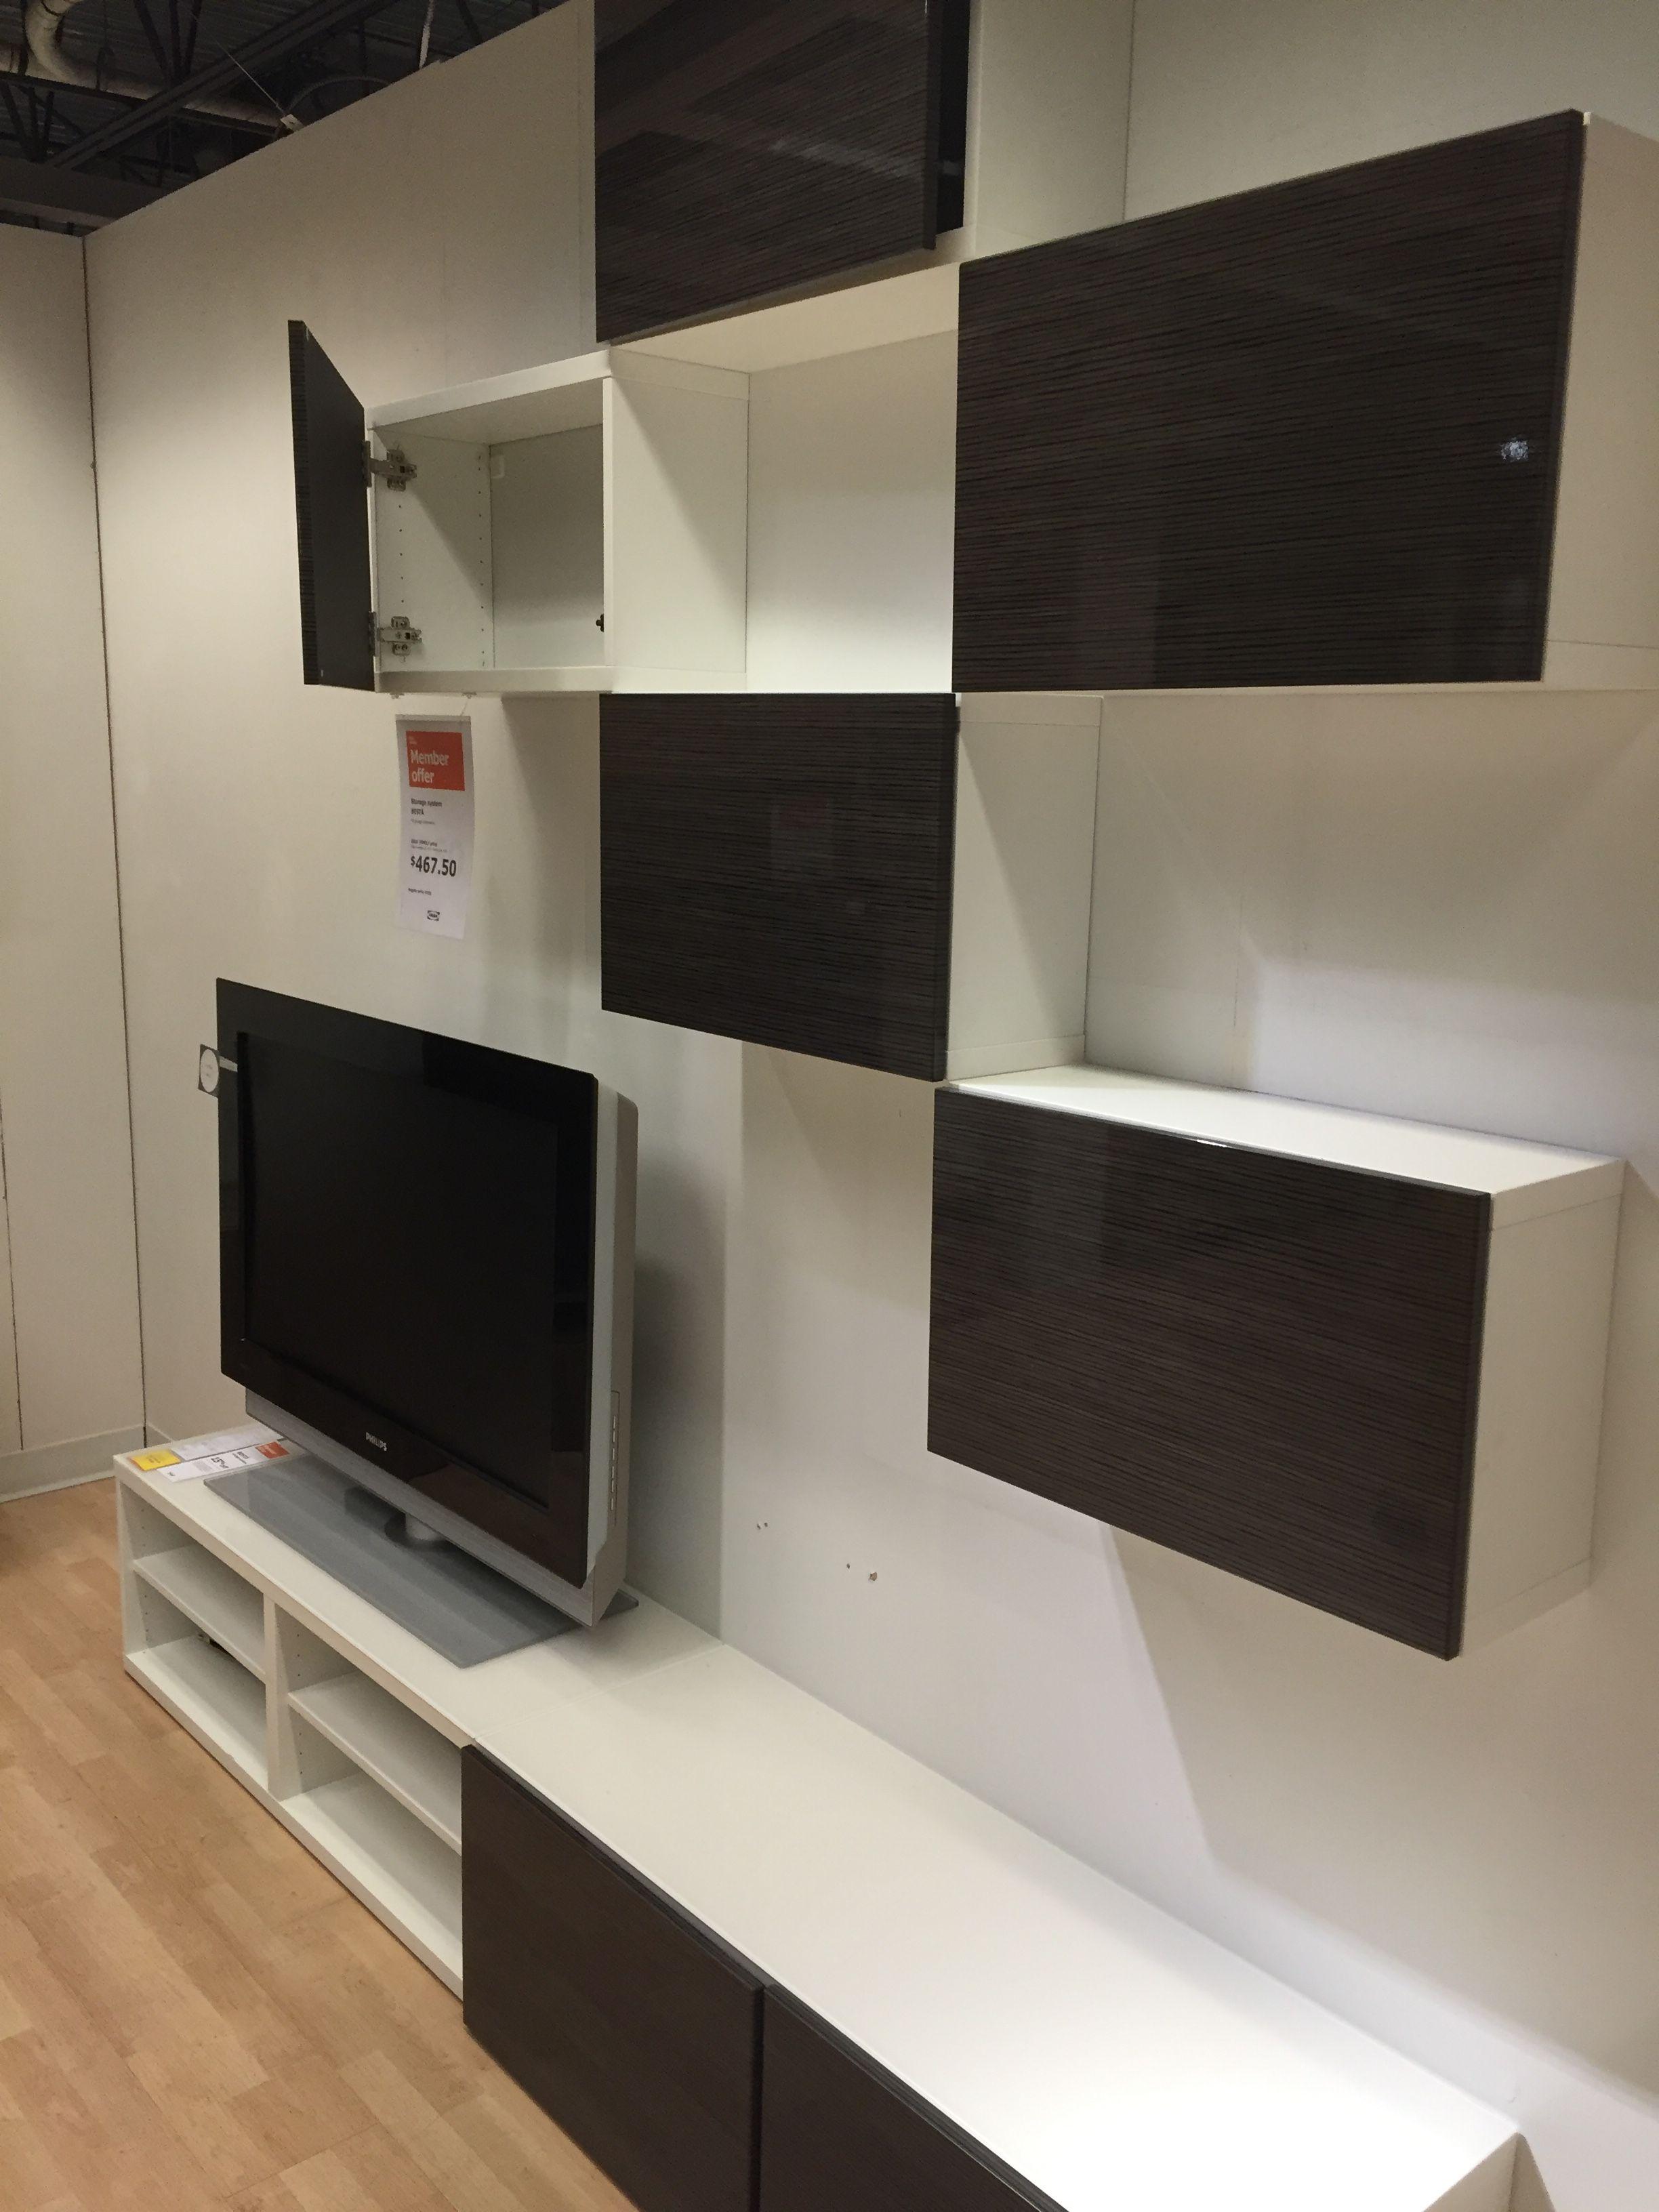 f7662552c887335b48a9c25b35d95510 Frais De Bar De Salon Ikea Concept